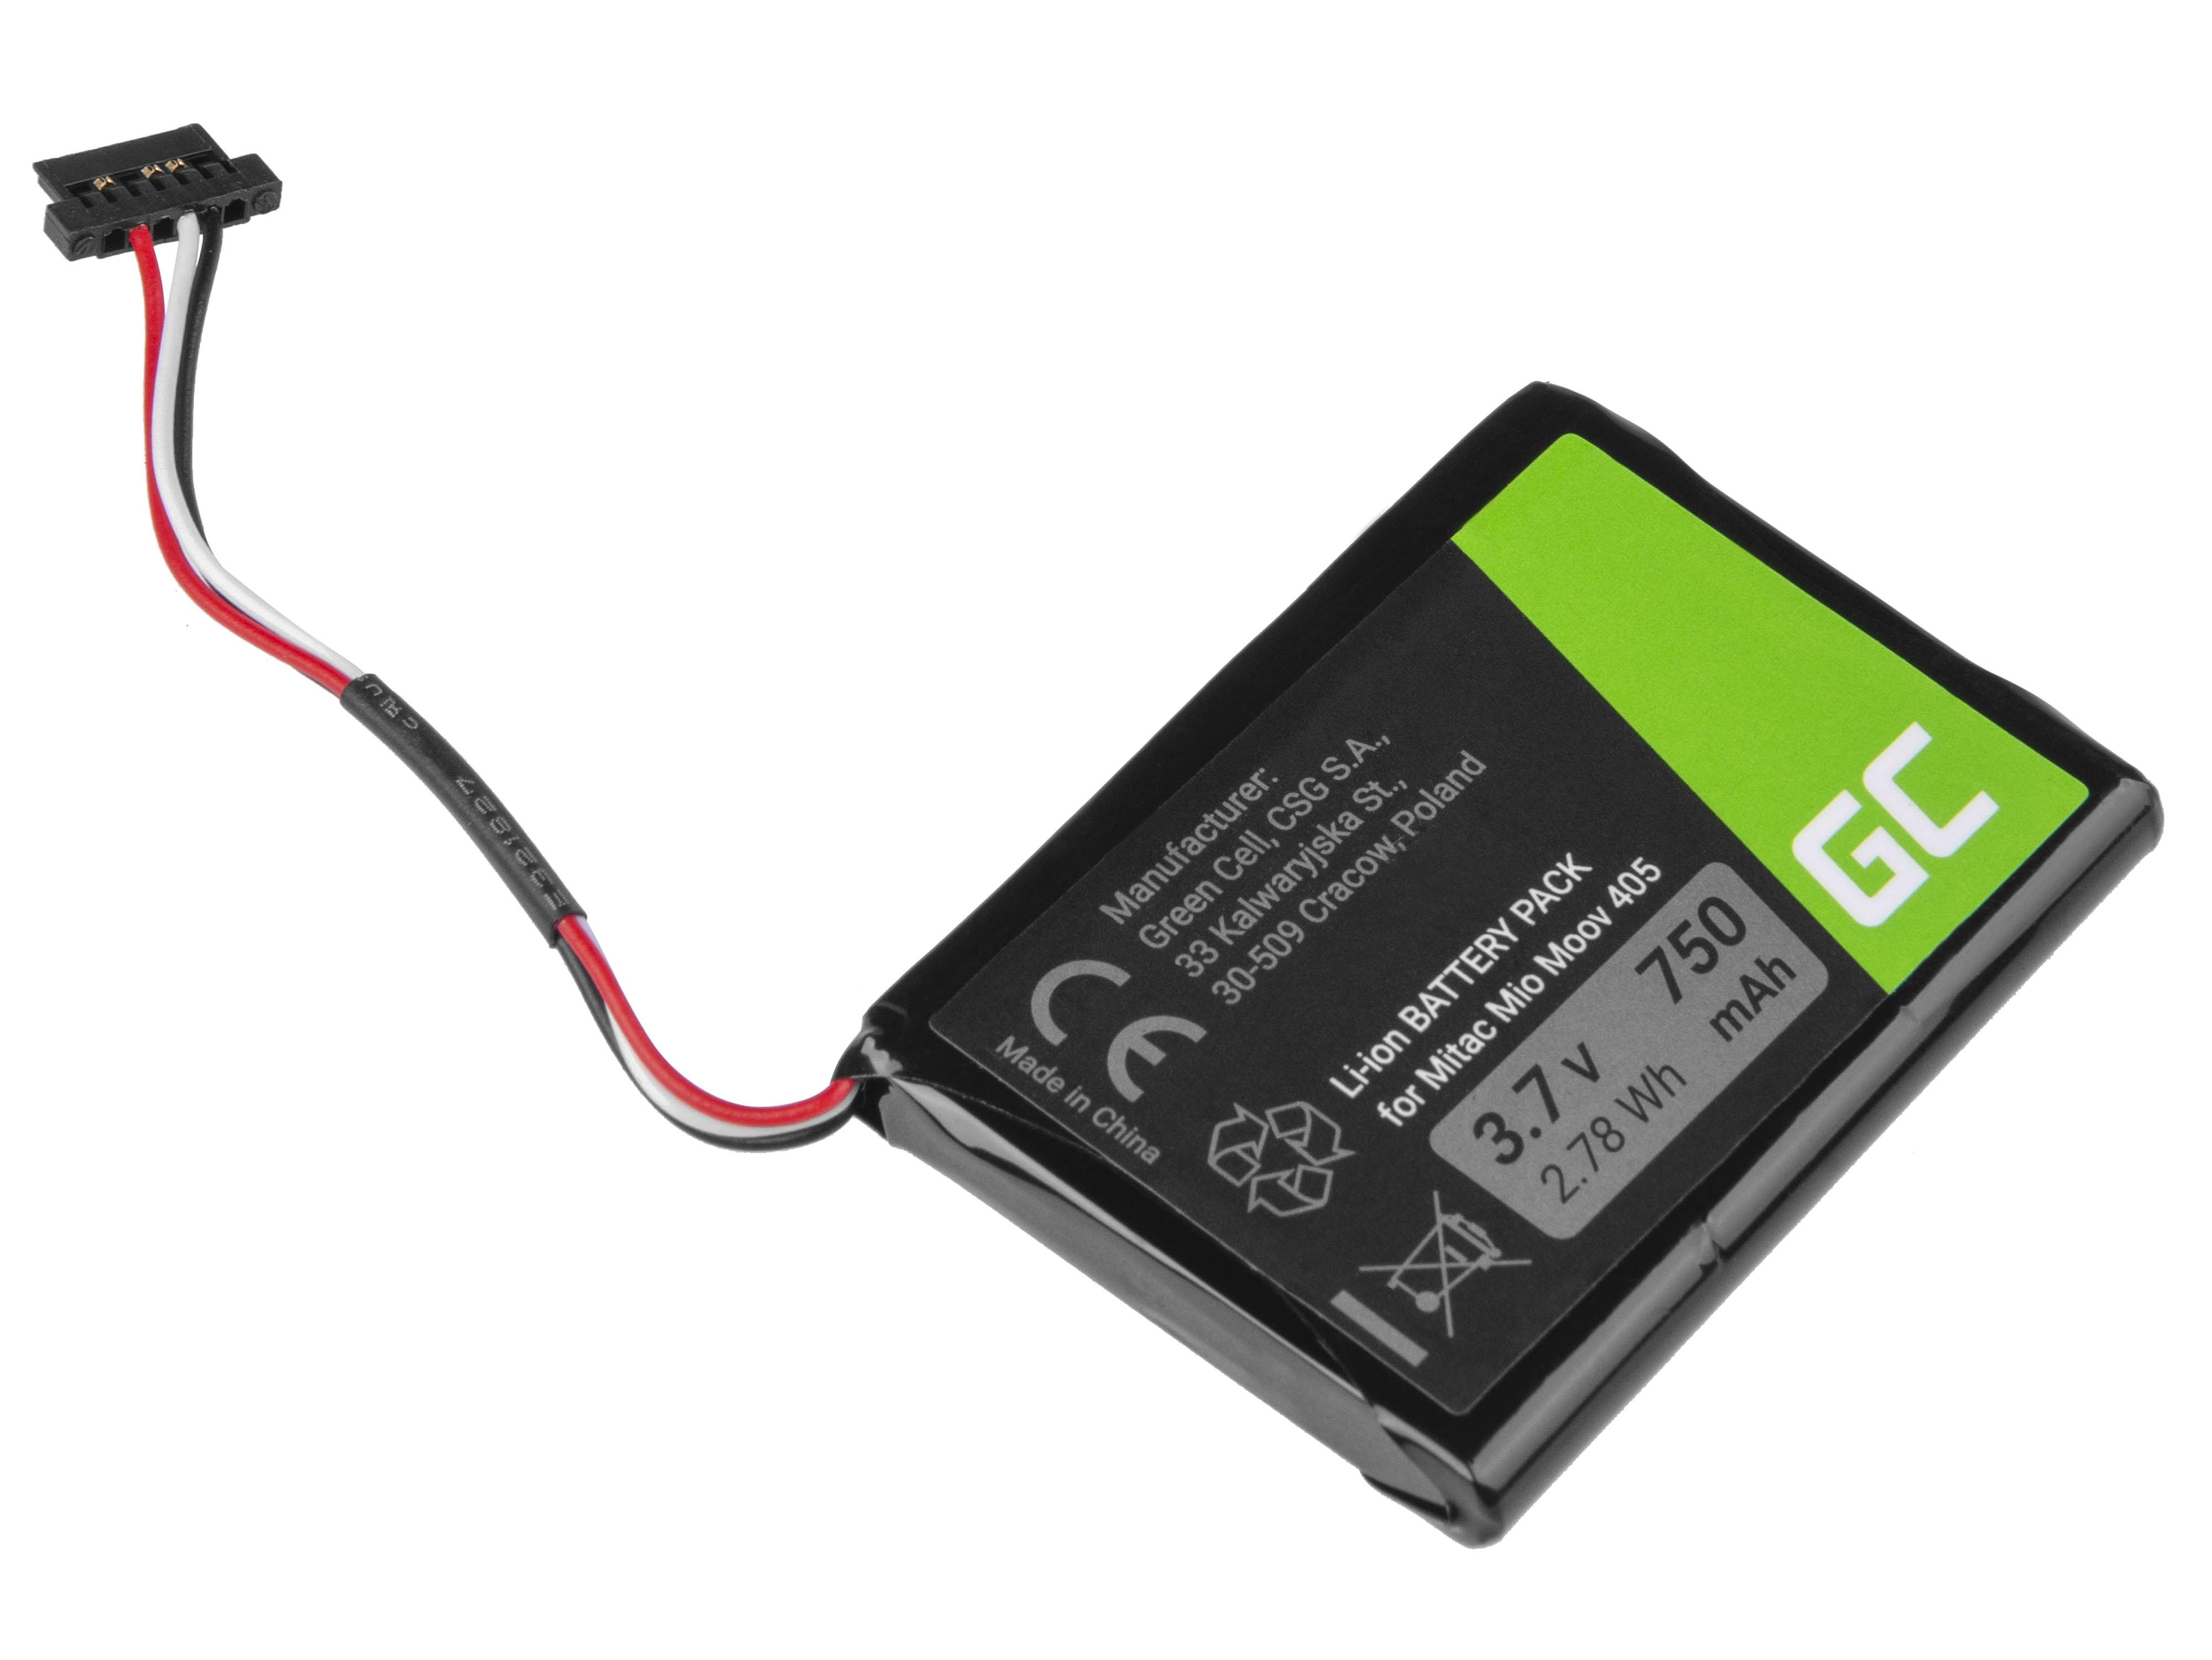 Green Cell Baterie GPS Moov CS-MIV400SL T300-3, GPS Moov 500 510 560 580 N210 750mAh Li-Ion – neoriginální